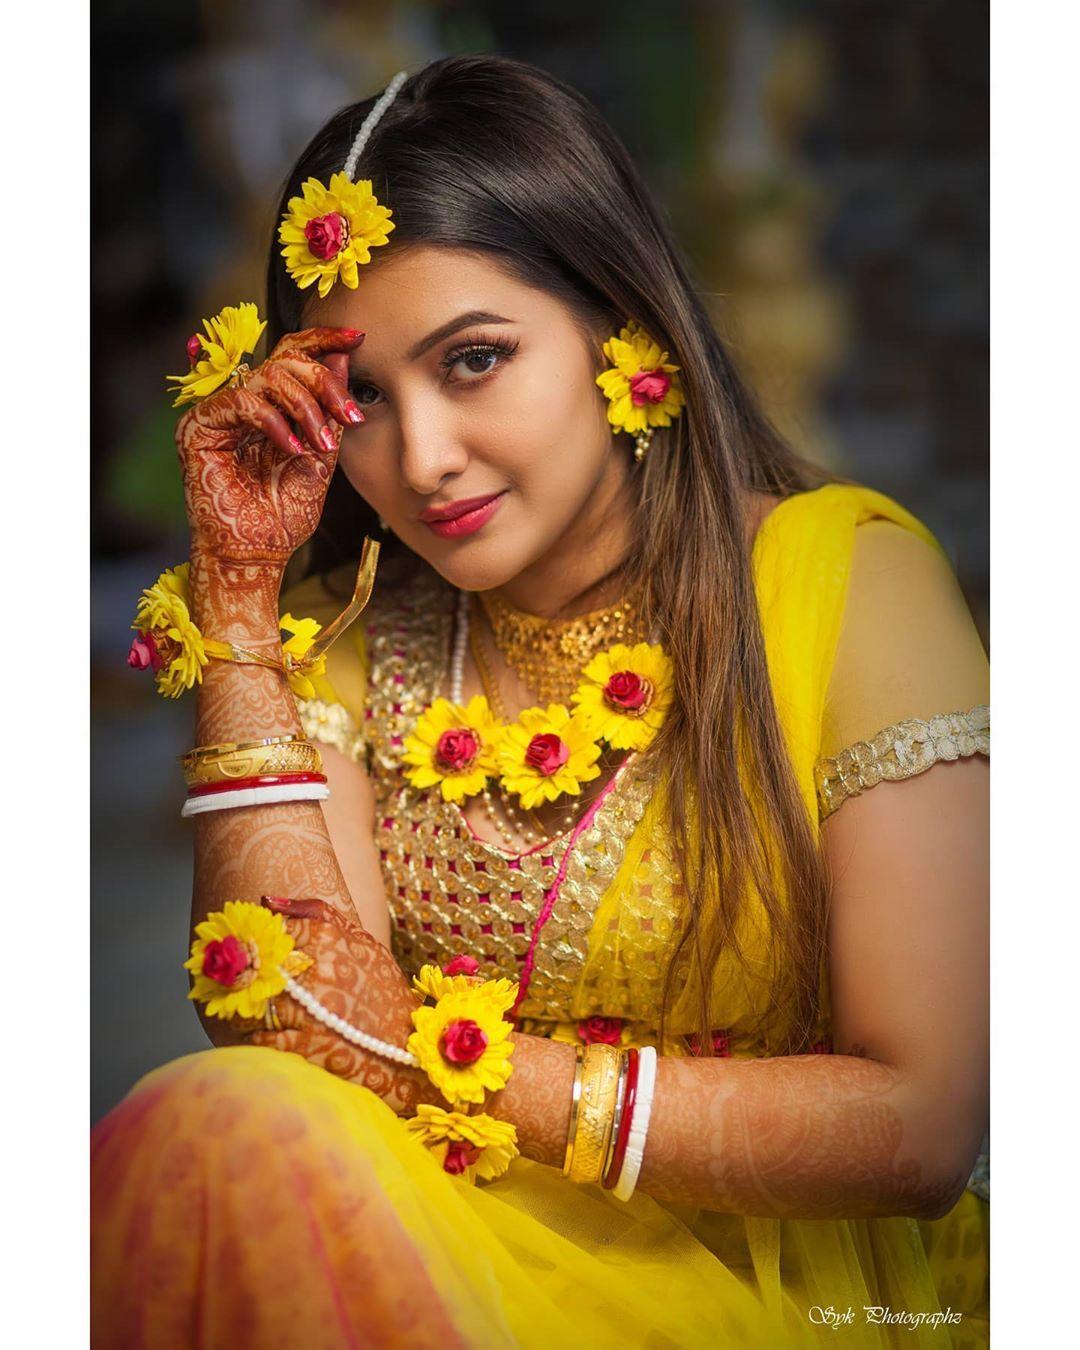 Haldi Ceremony Sumitpriya Official Photographer Sayak Chuckervertii By Syk Photogr Indian Wedding Photography Poses Haldi Ceremony Wedding Photos Poses